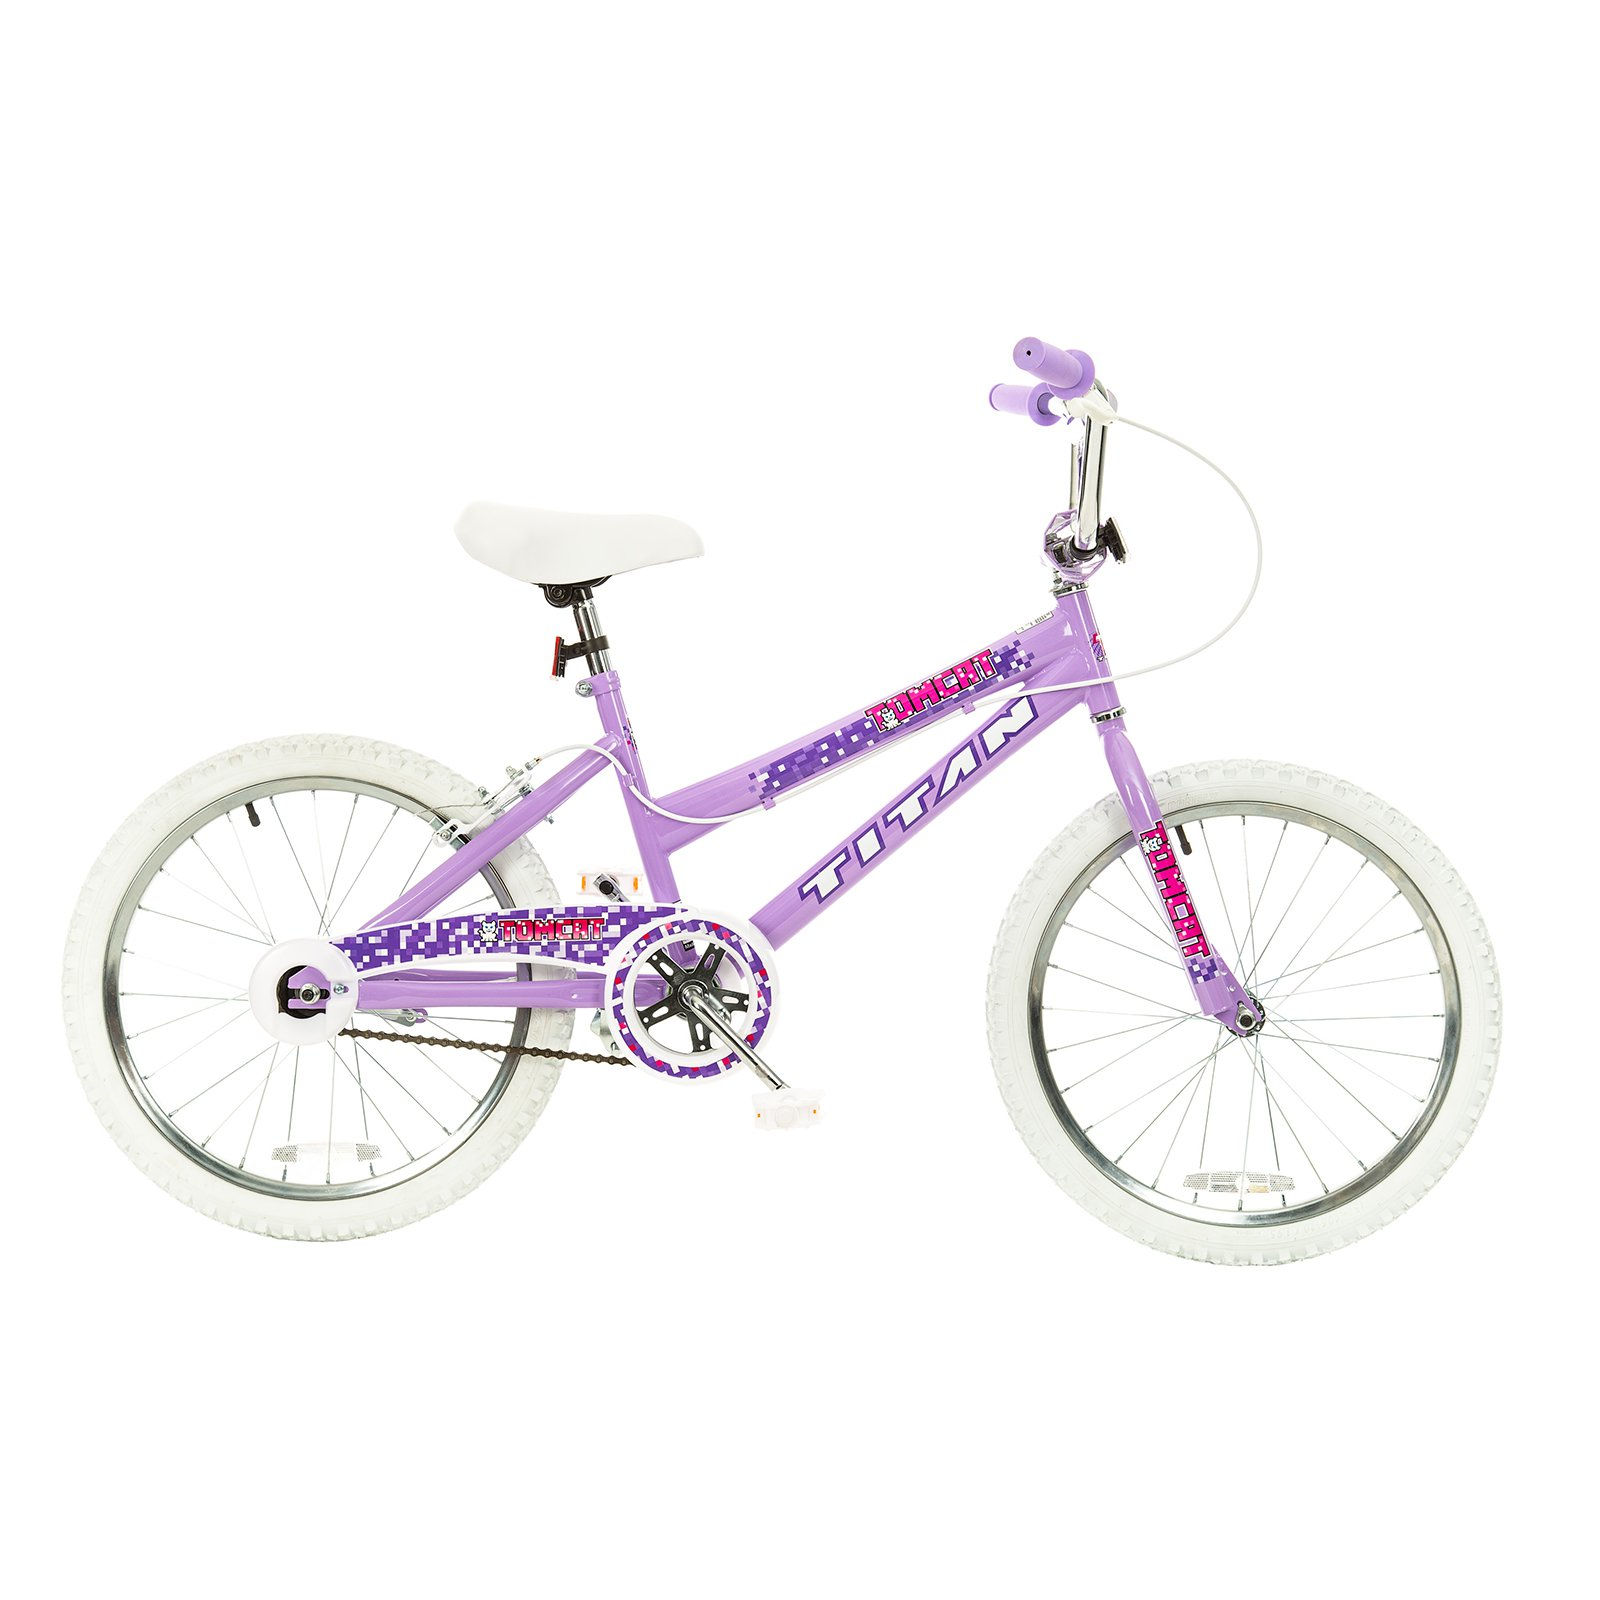 "TITAN Tomcat Girls BMX Bike with 20"" Wheels, Lavender"